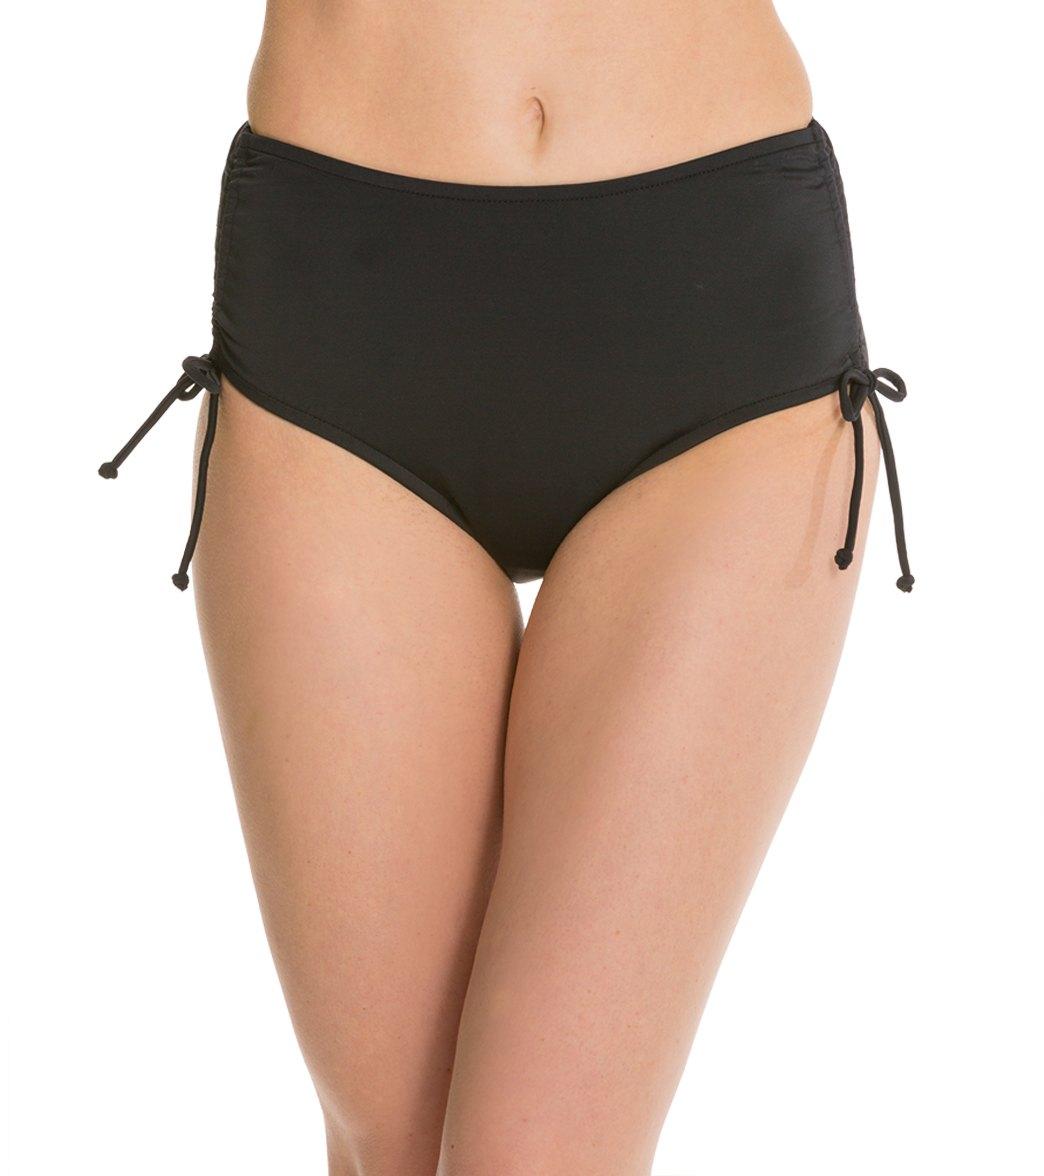 bcad84a04d710 Caribbean Joe Solid Tummy Control Adjustable Bikini Bottom at SwimOutlet.com